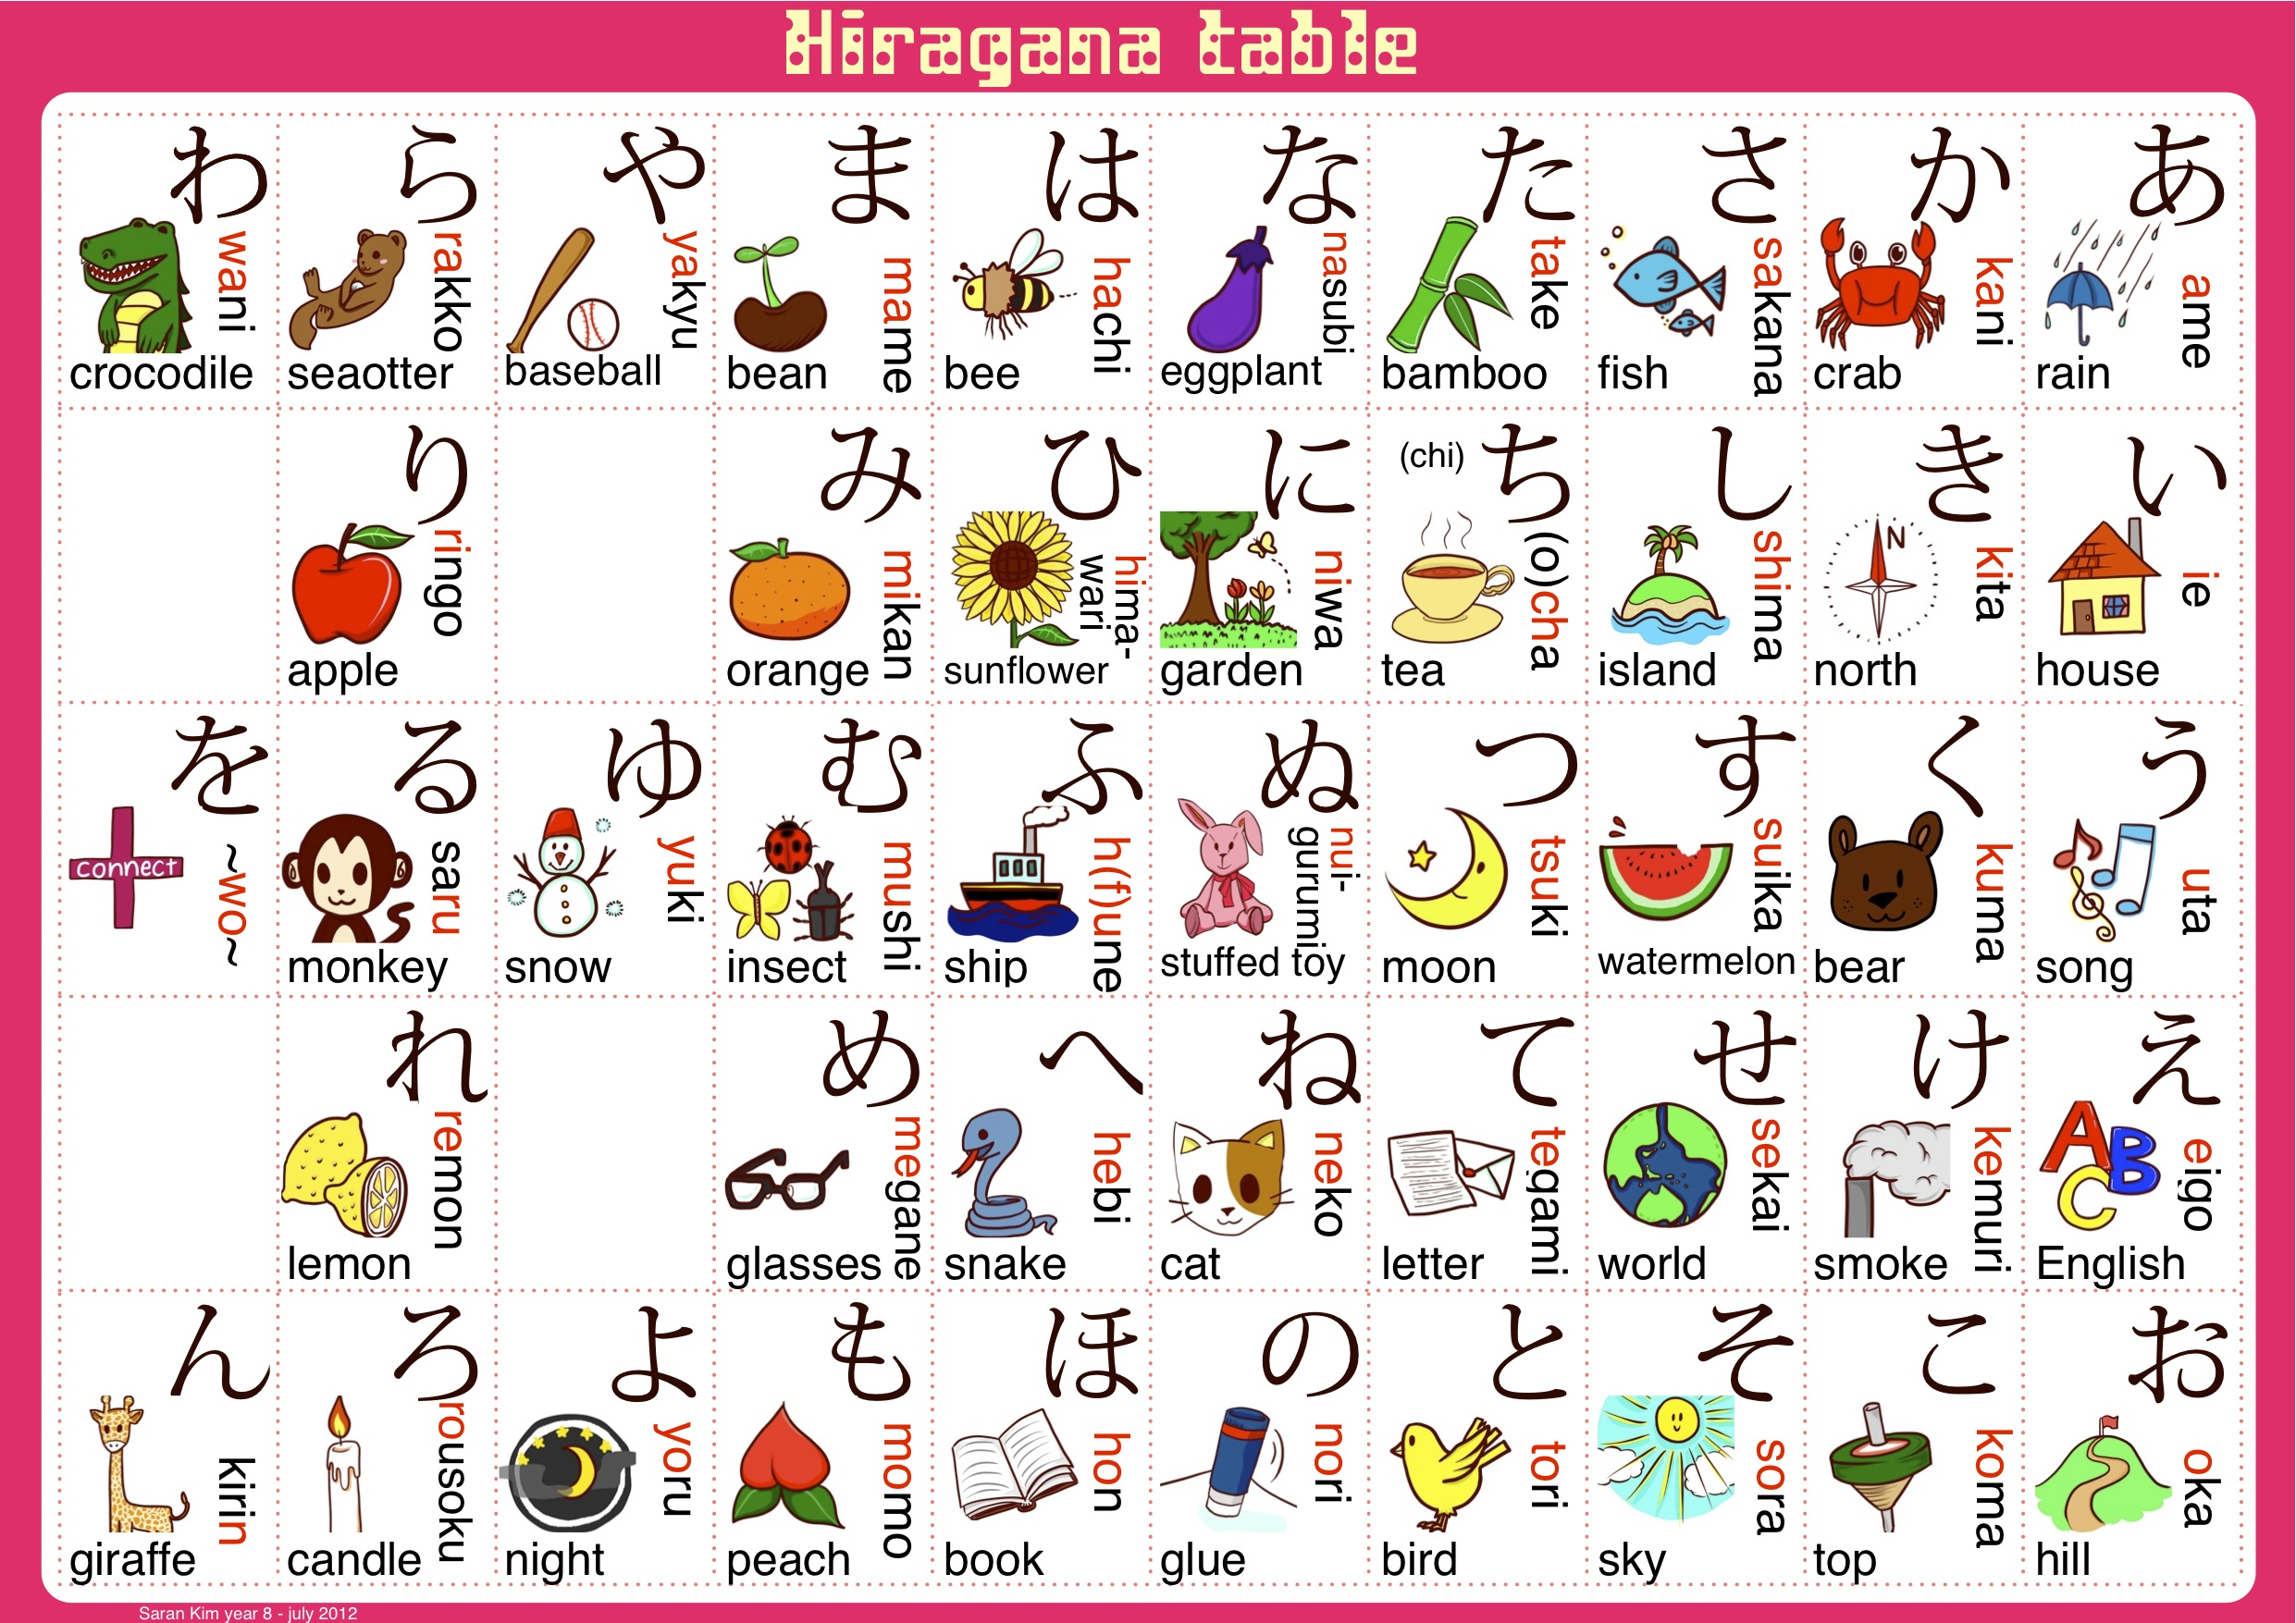 Hiragana Table Saran Kim Blog